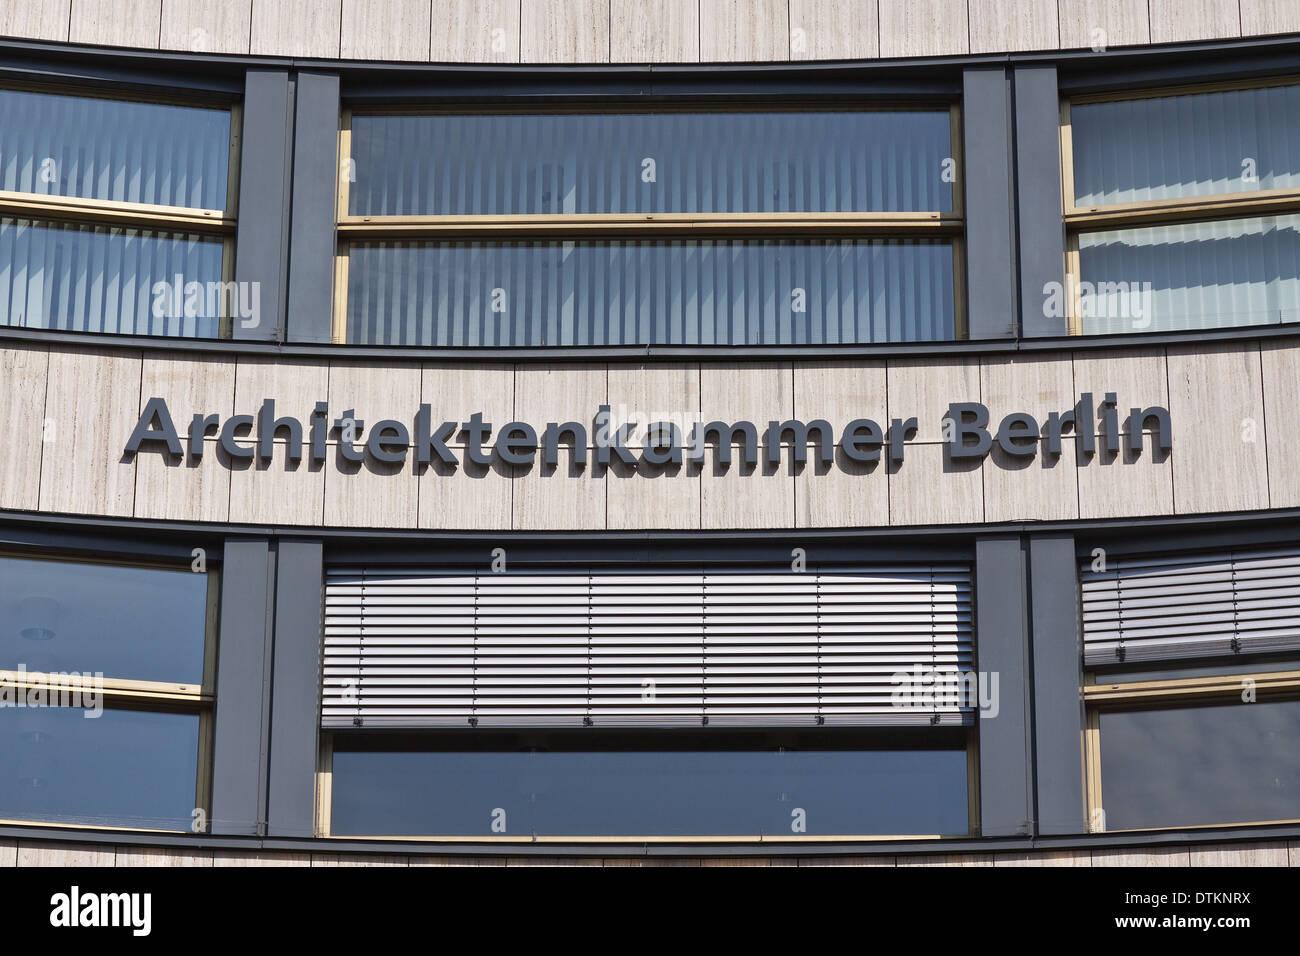 Architektenkammer Berlin Stock Photos Architektenkammer Berlin